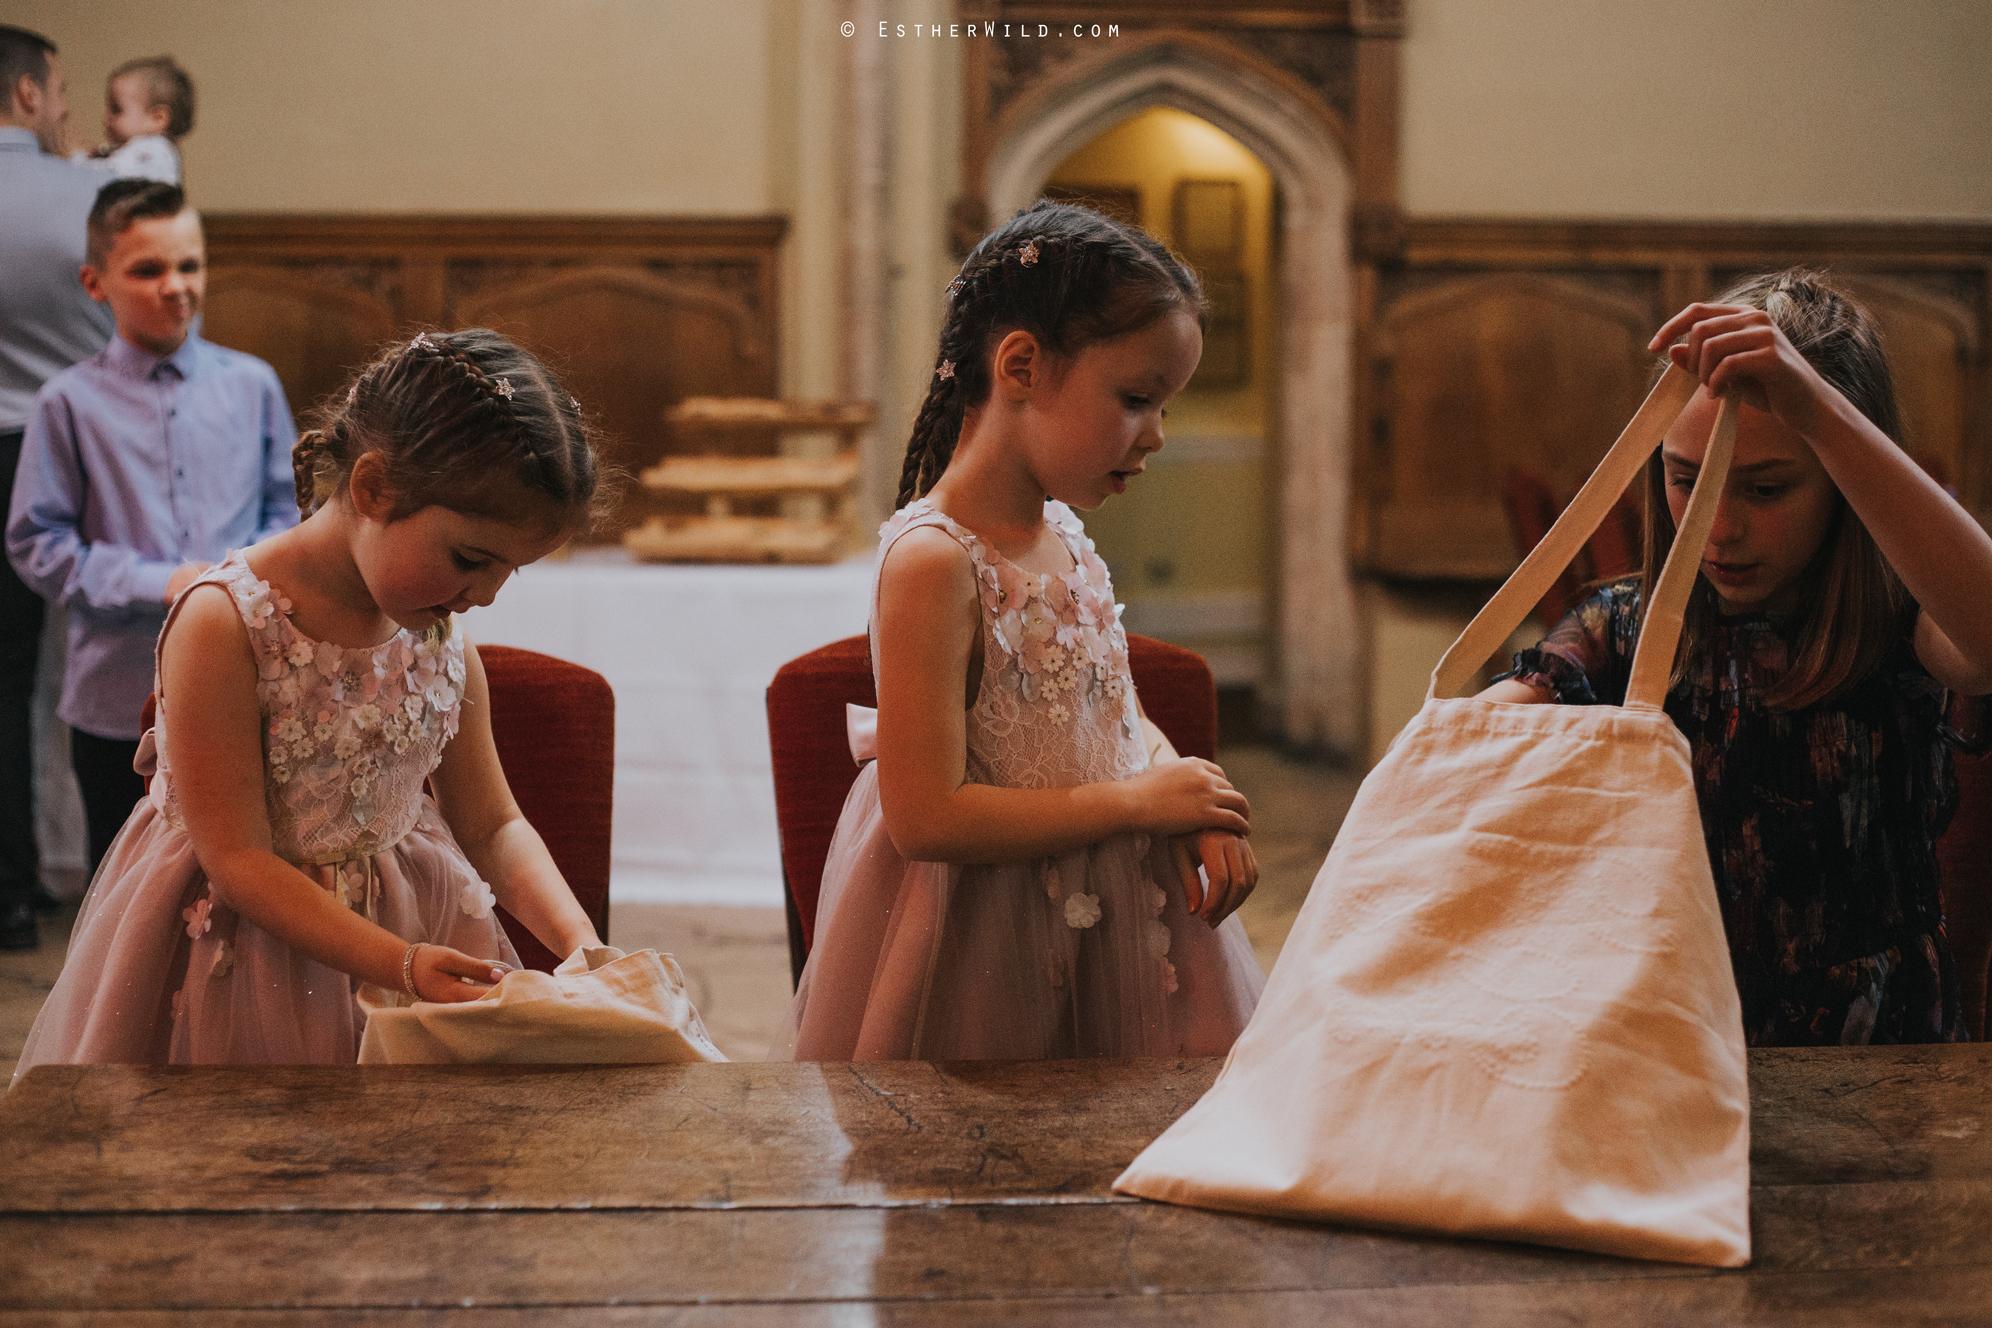 Wedding_Kings_Lynn_Town_Hall_Norfolk_Photographer_Esther_Wild_IMG_1688.jpg